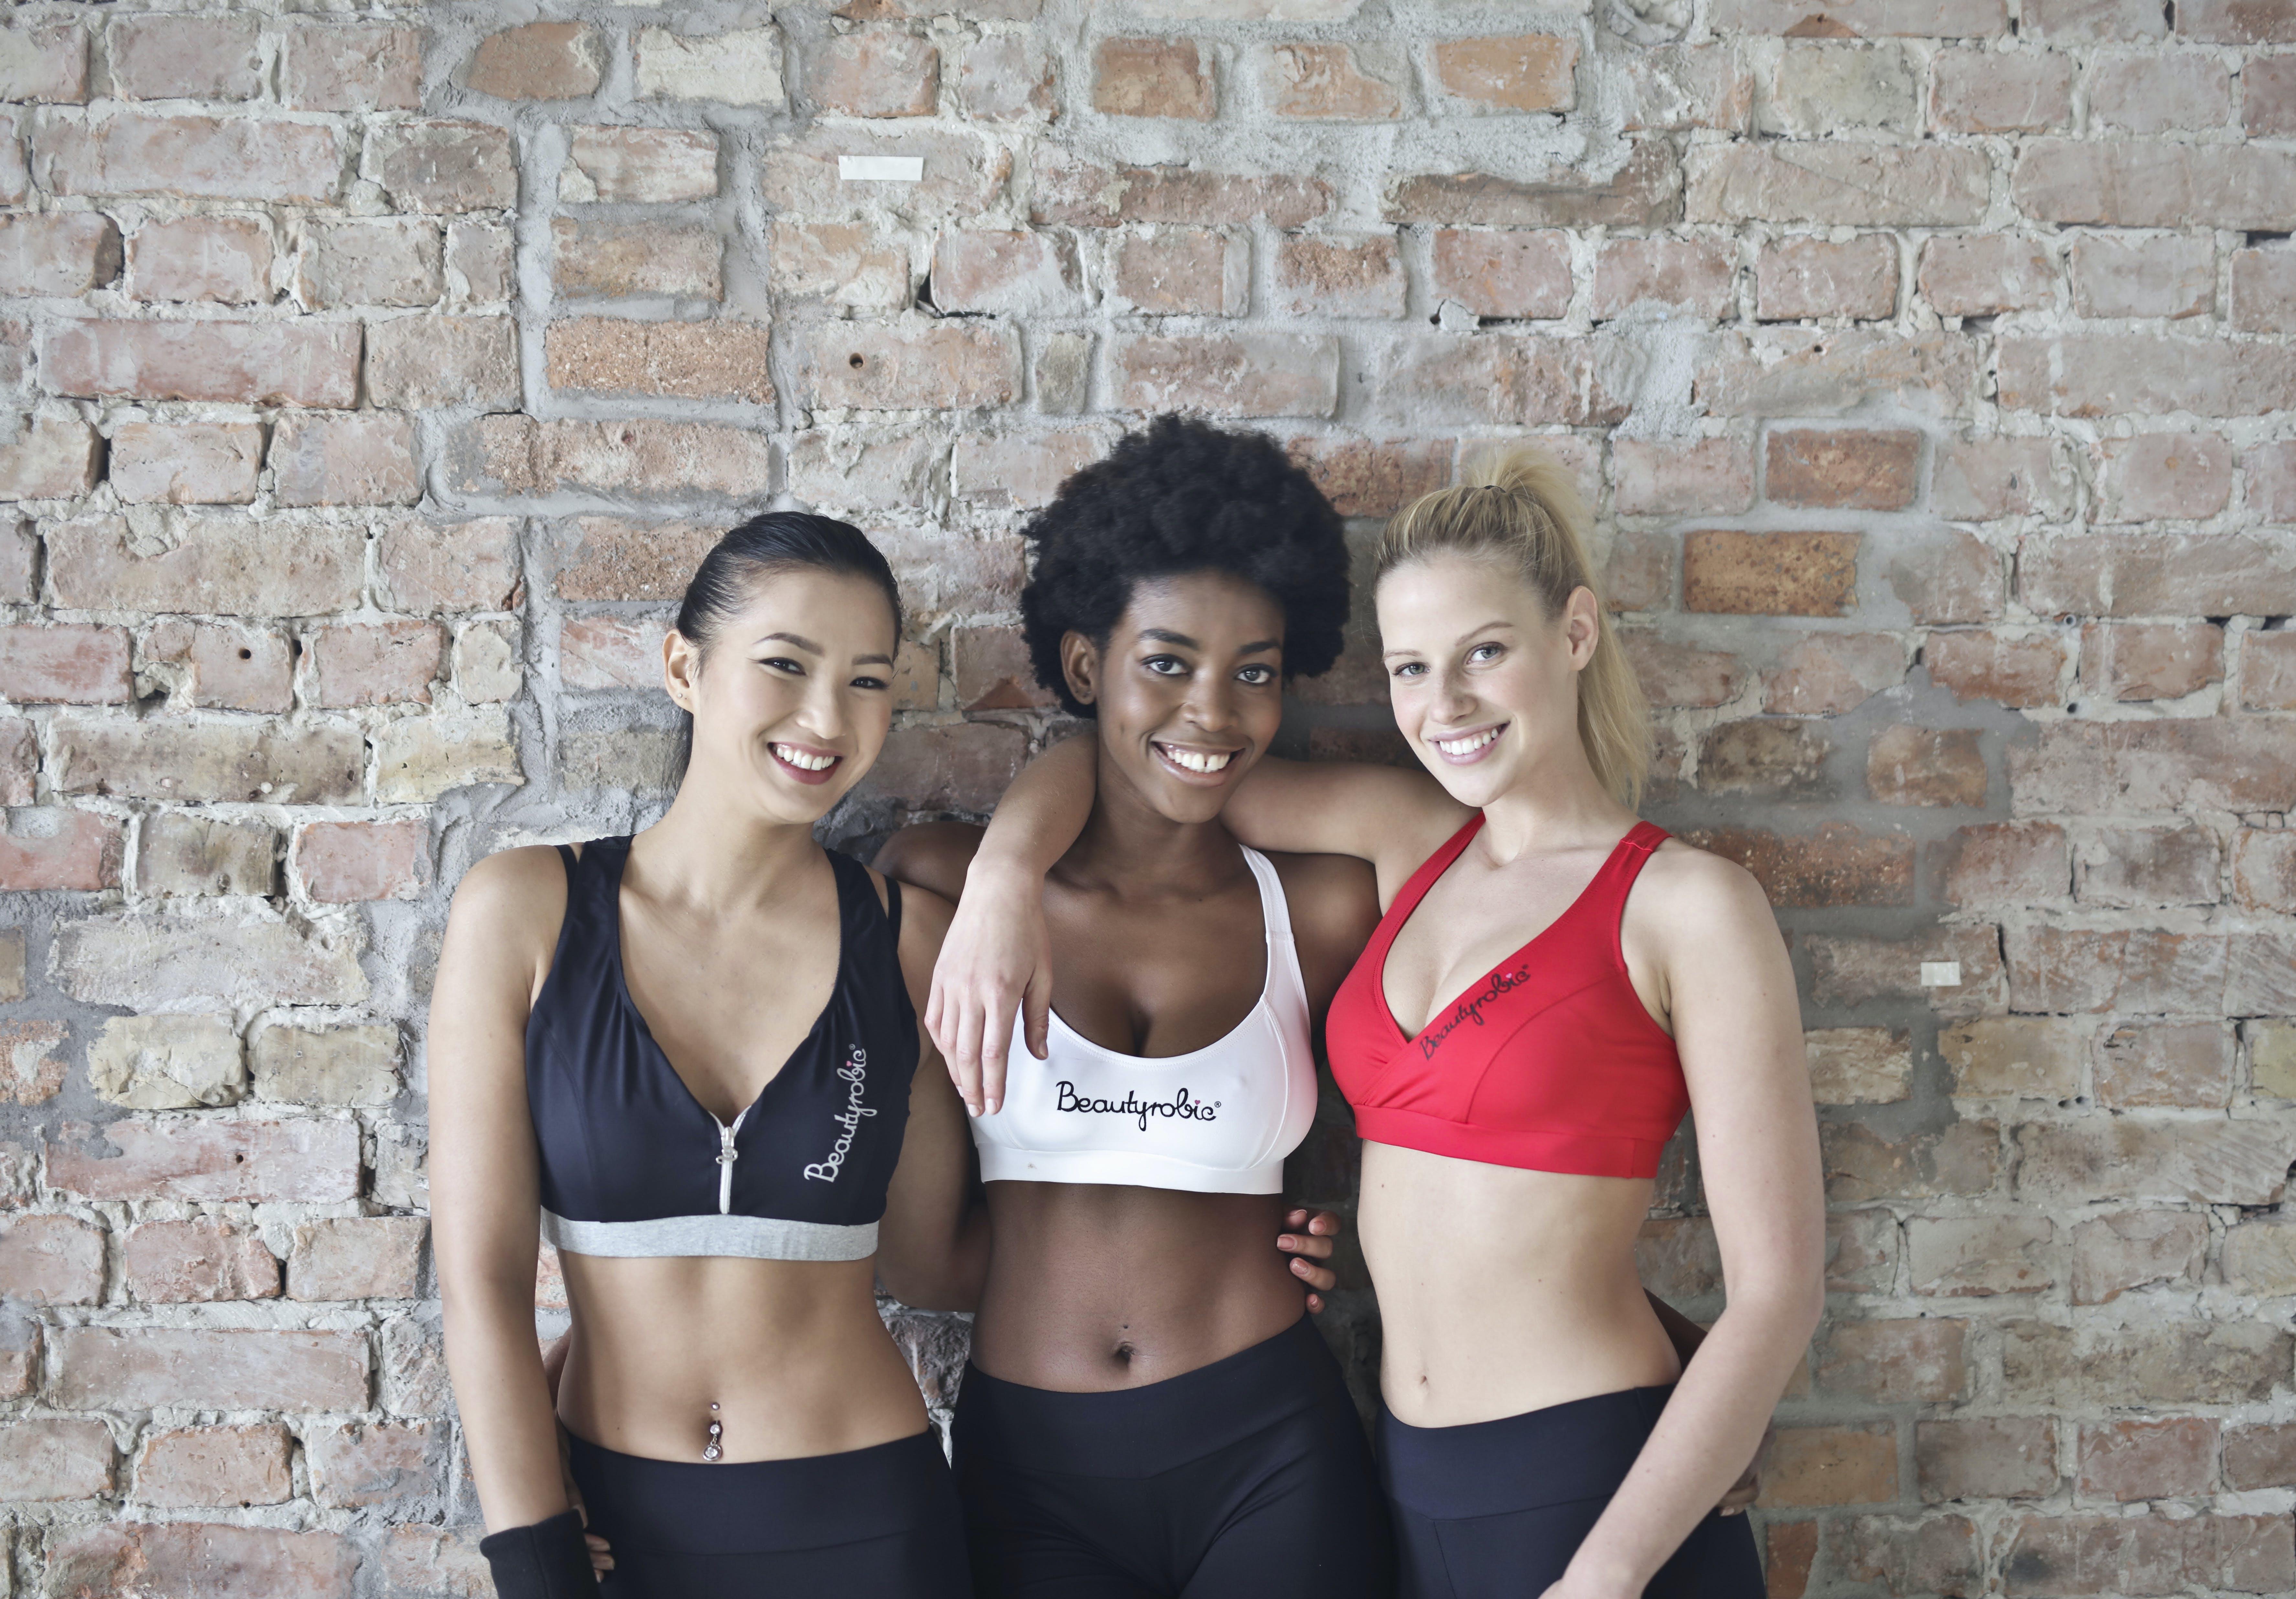 Three Women Wearing Sports Bras and Leggings